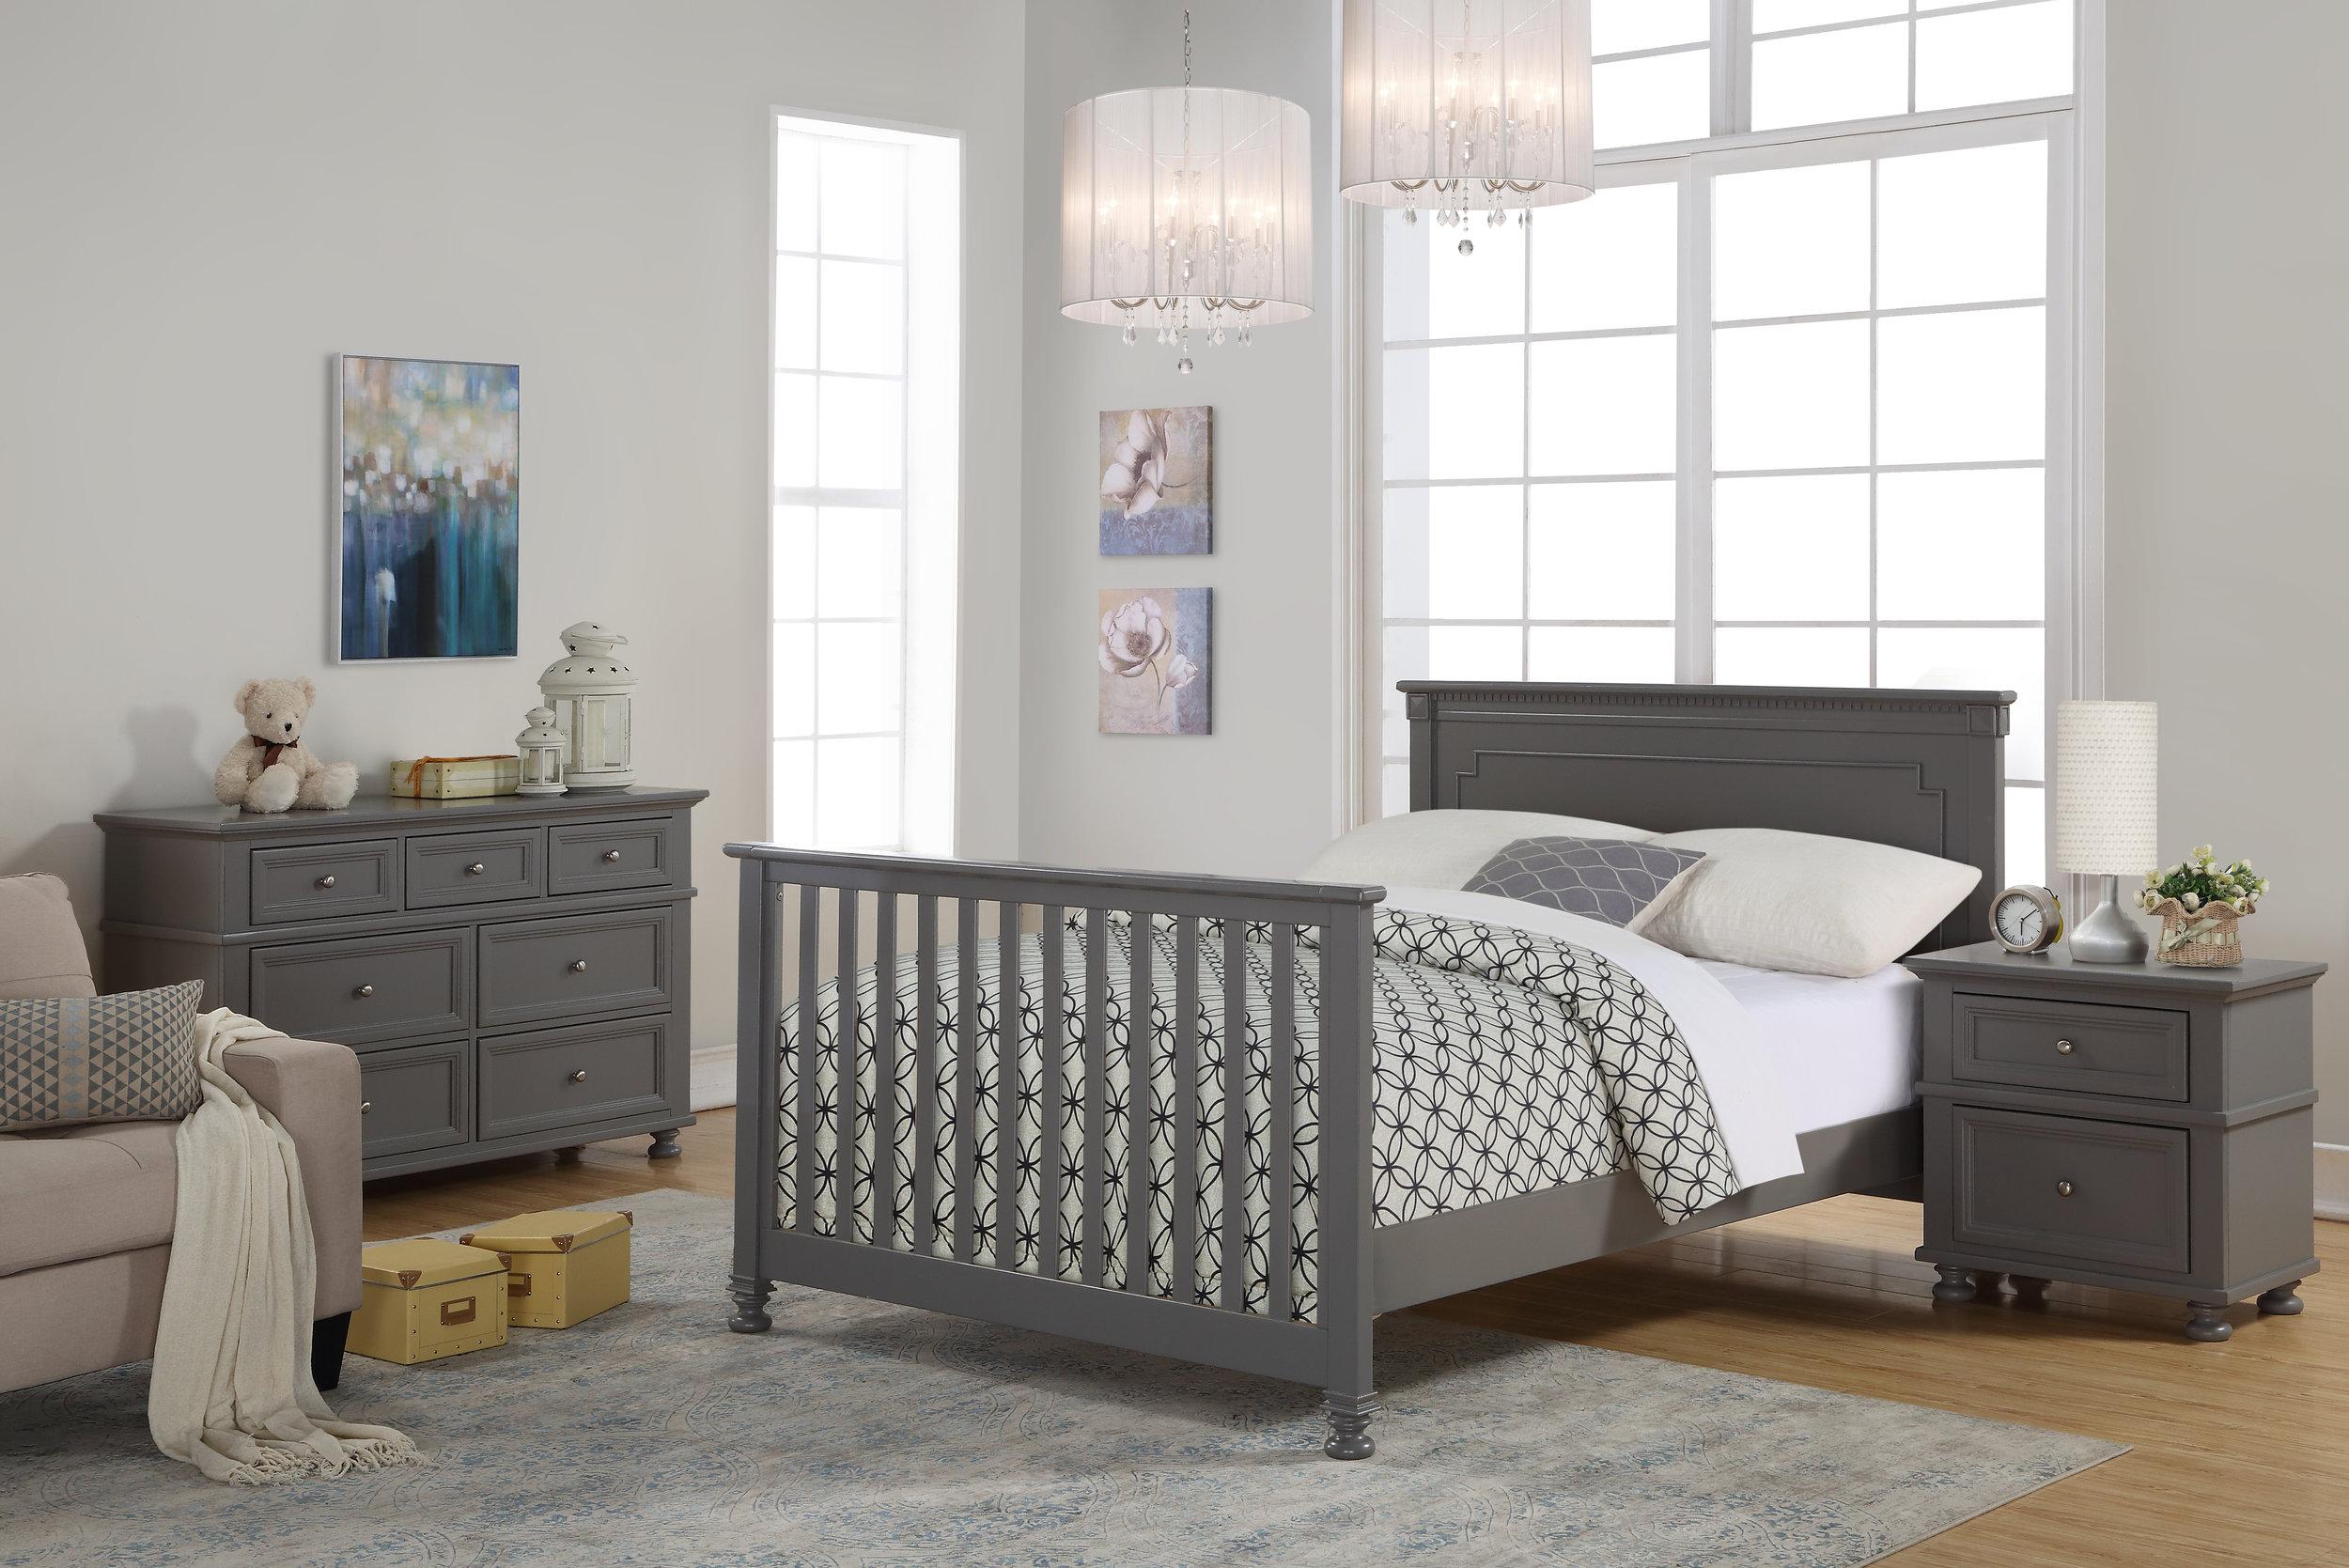 HR Belgian Full Bed with 7Dr Dresser & NT - Pebble Grey.jpg